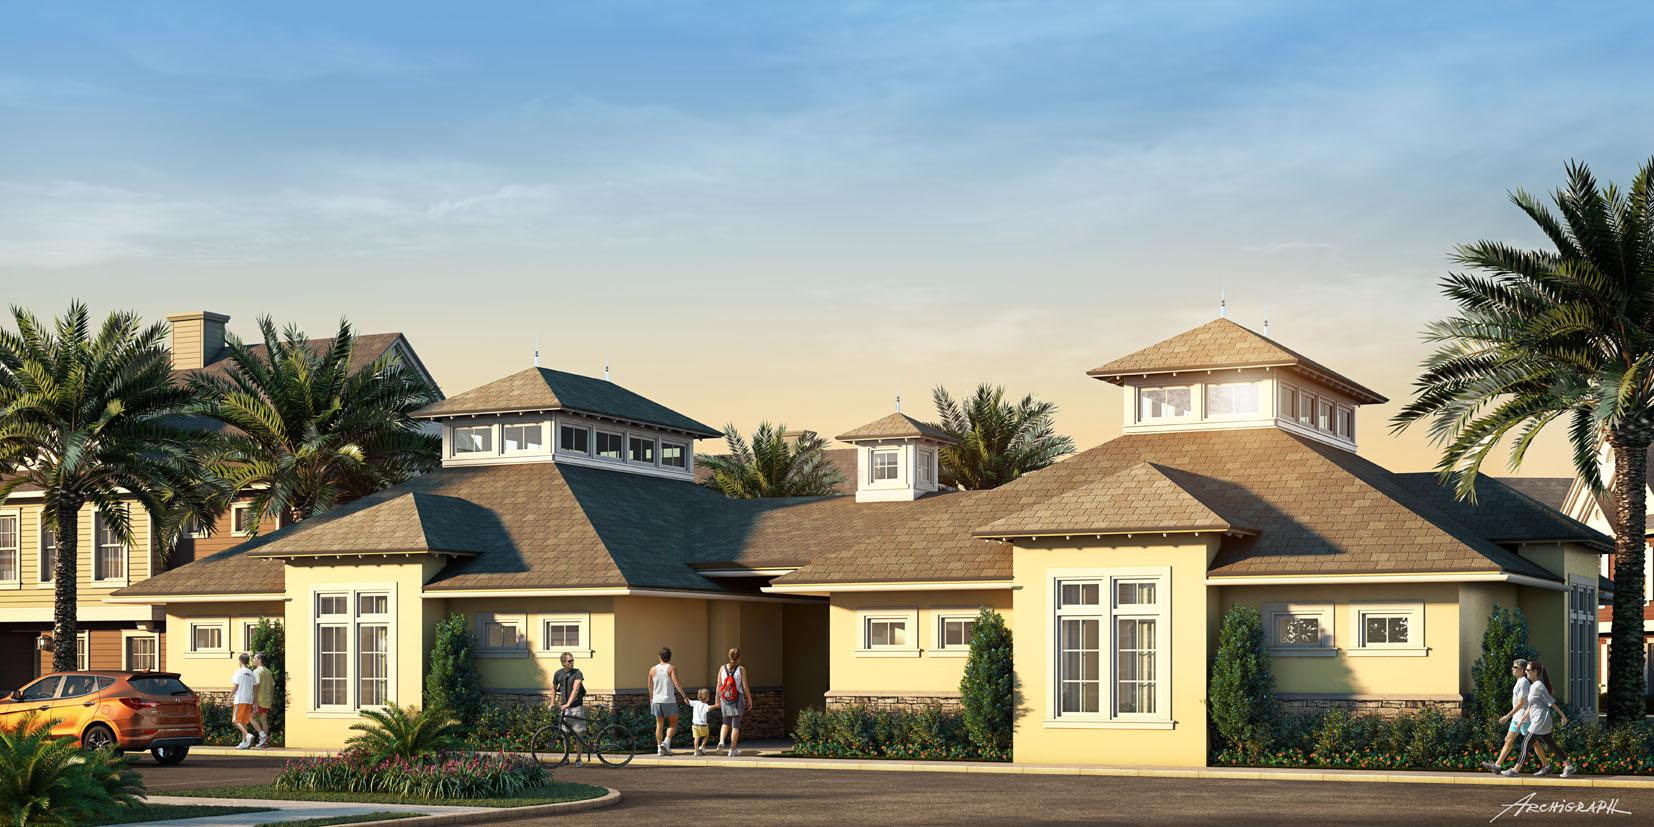 Summerville Resort  Casas 5 4 e 3 Quartos em Kissimmee  FL